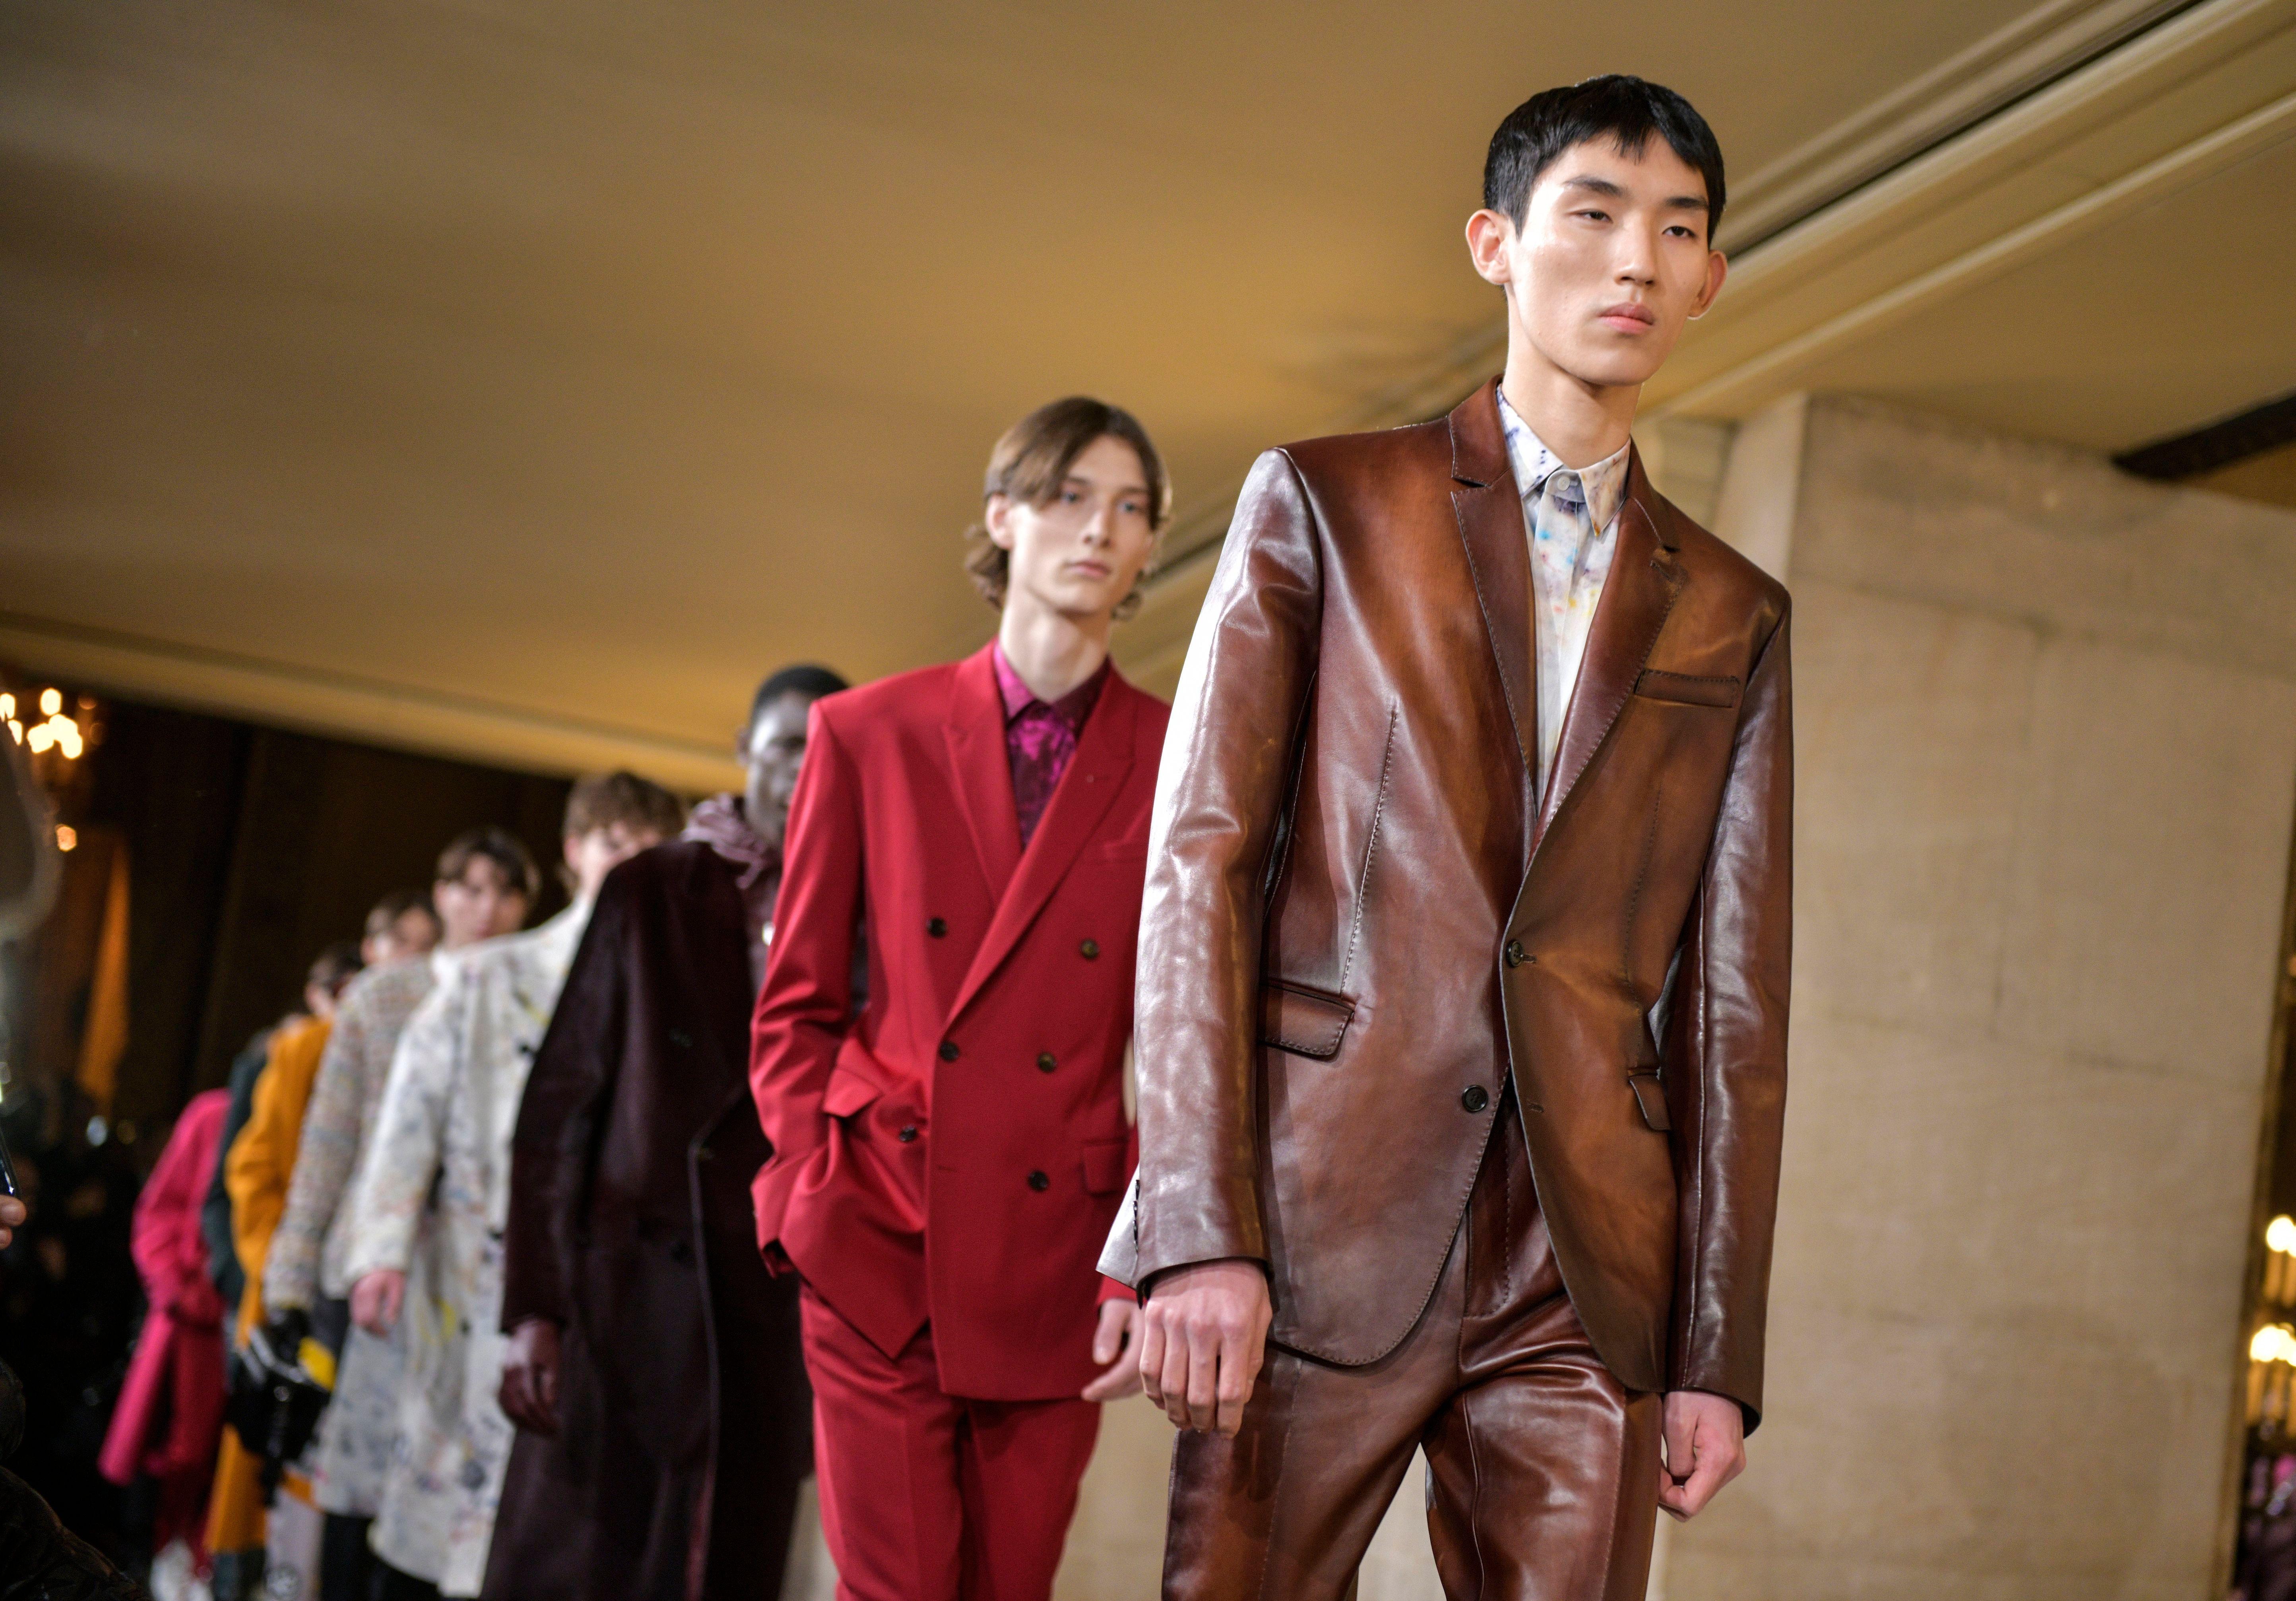 Models on the catwalkBerluti show, Runway, Fall Winter 2019, Paris Fashion Week Men's, France - 18 Jan 2019